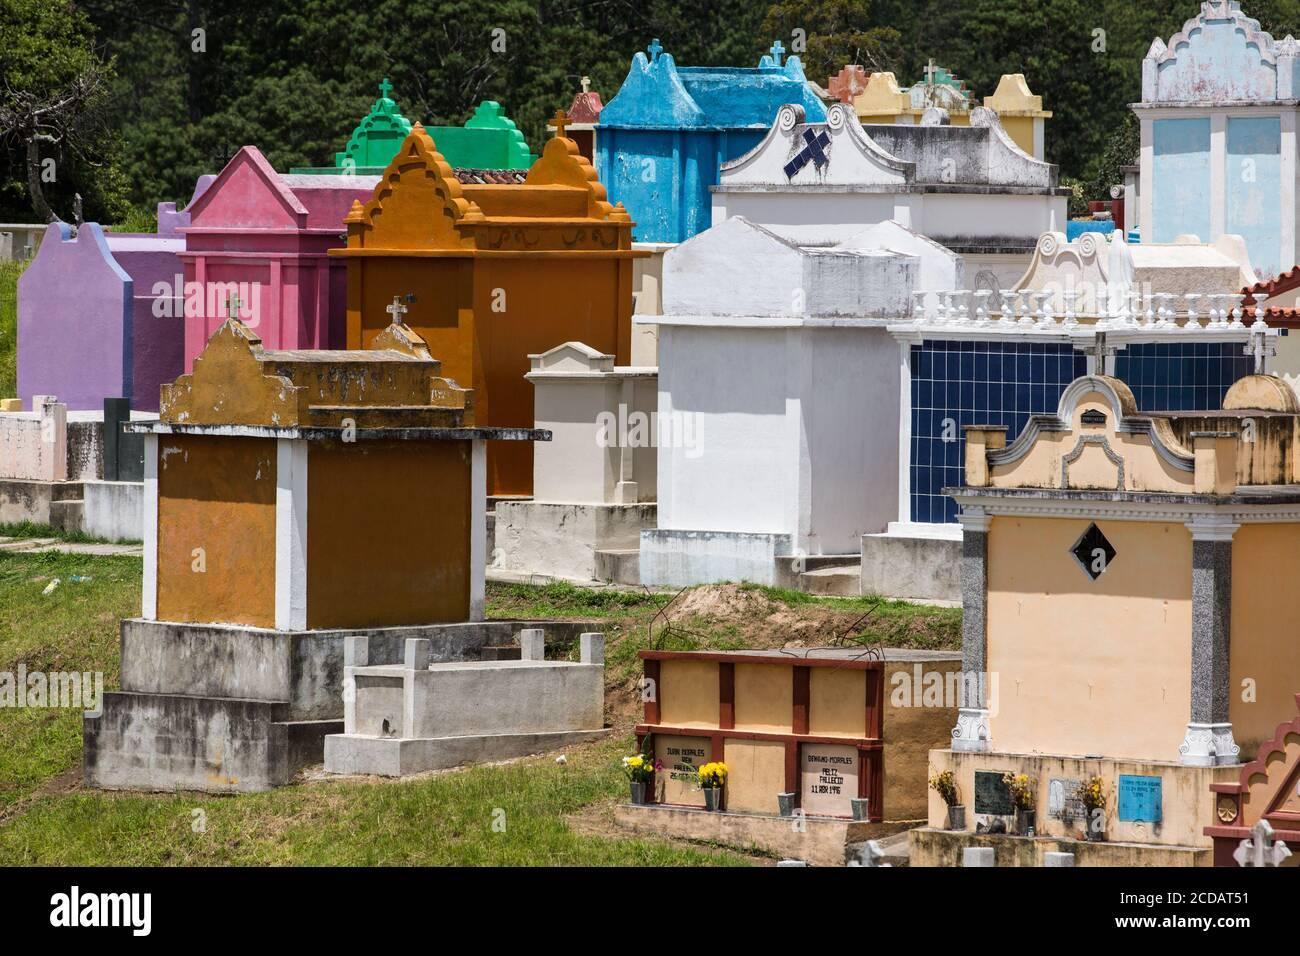 Detalle Architecutral de coloridas criptas funerarias en el cementerio de Chichicastenango, Guatemala. Foto de stock